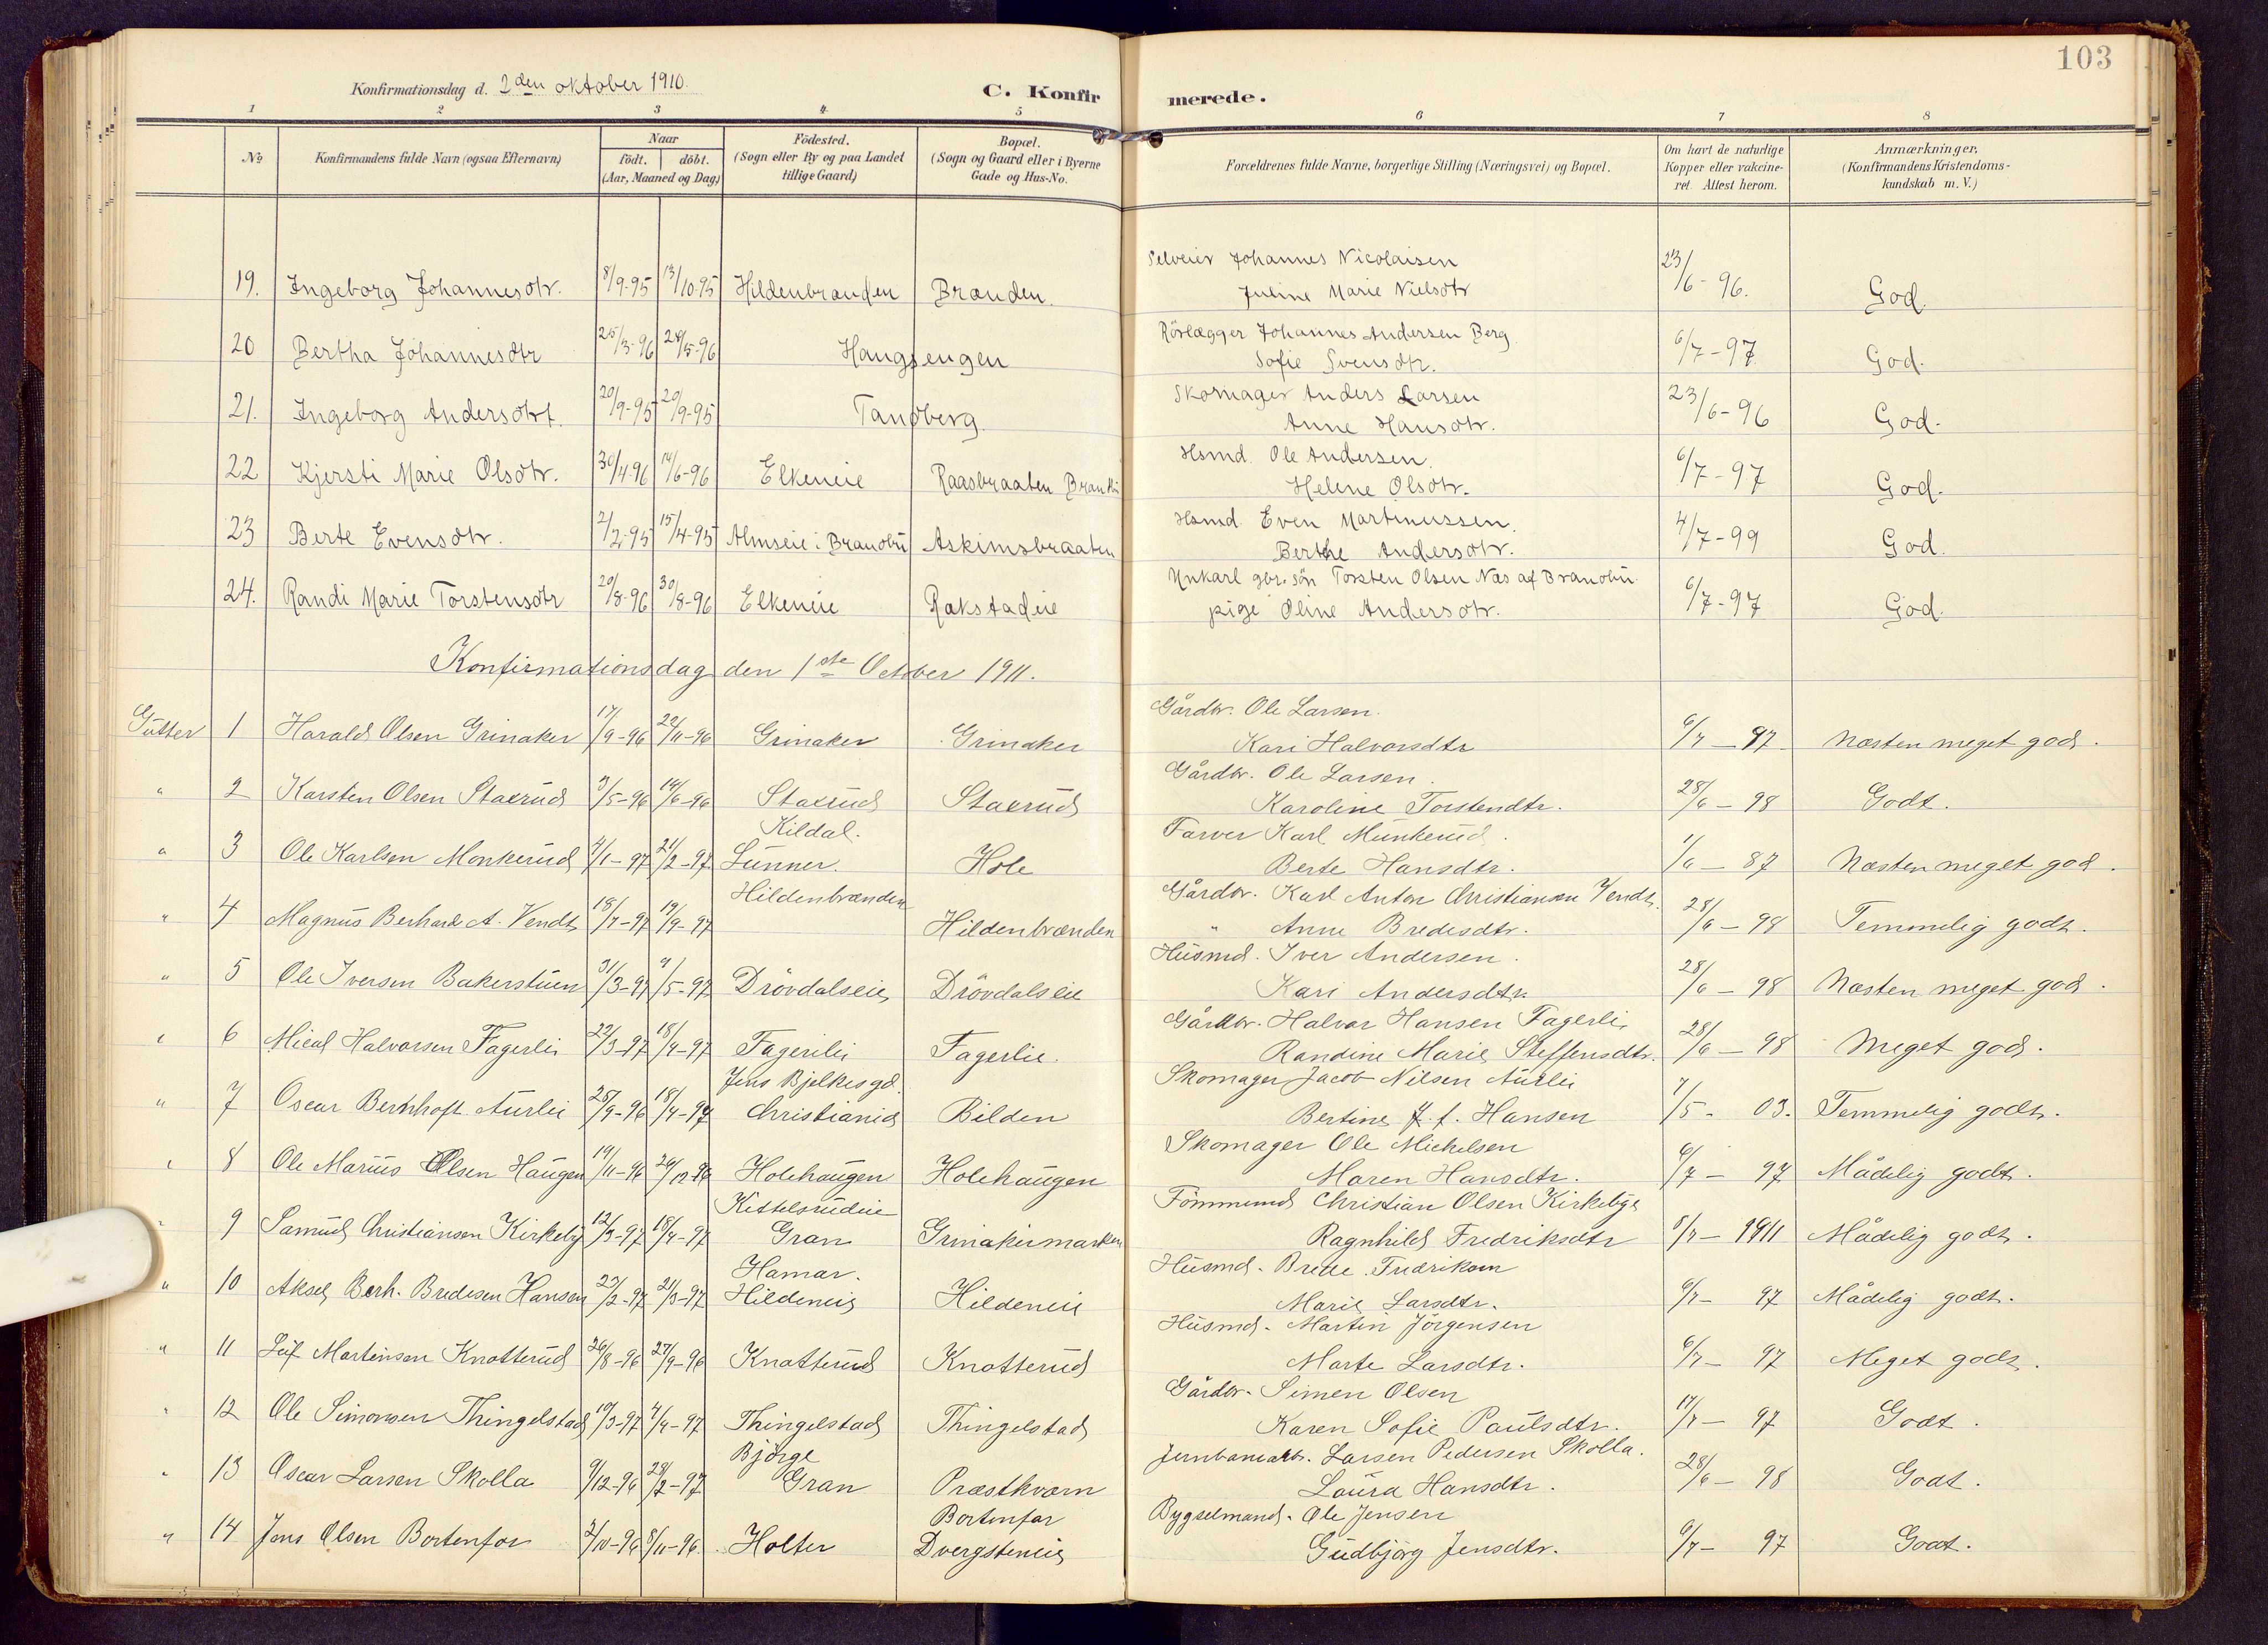 SAH, Brandbu prestekontor, Klokkerbok nr. 9, 1903-1916, s. 103